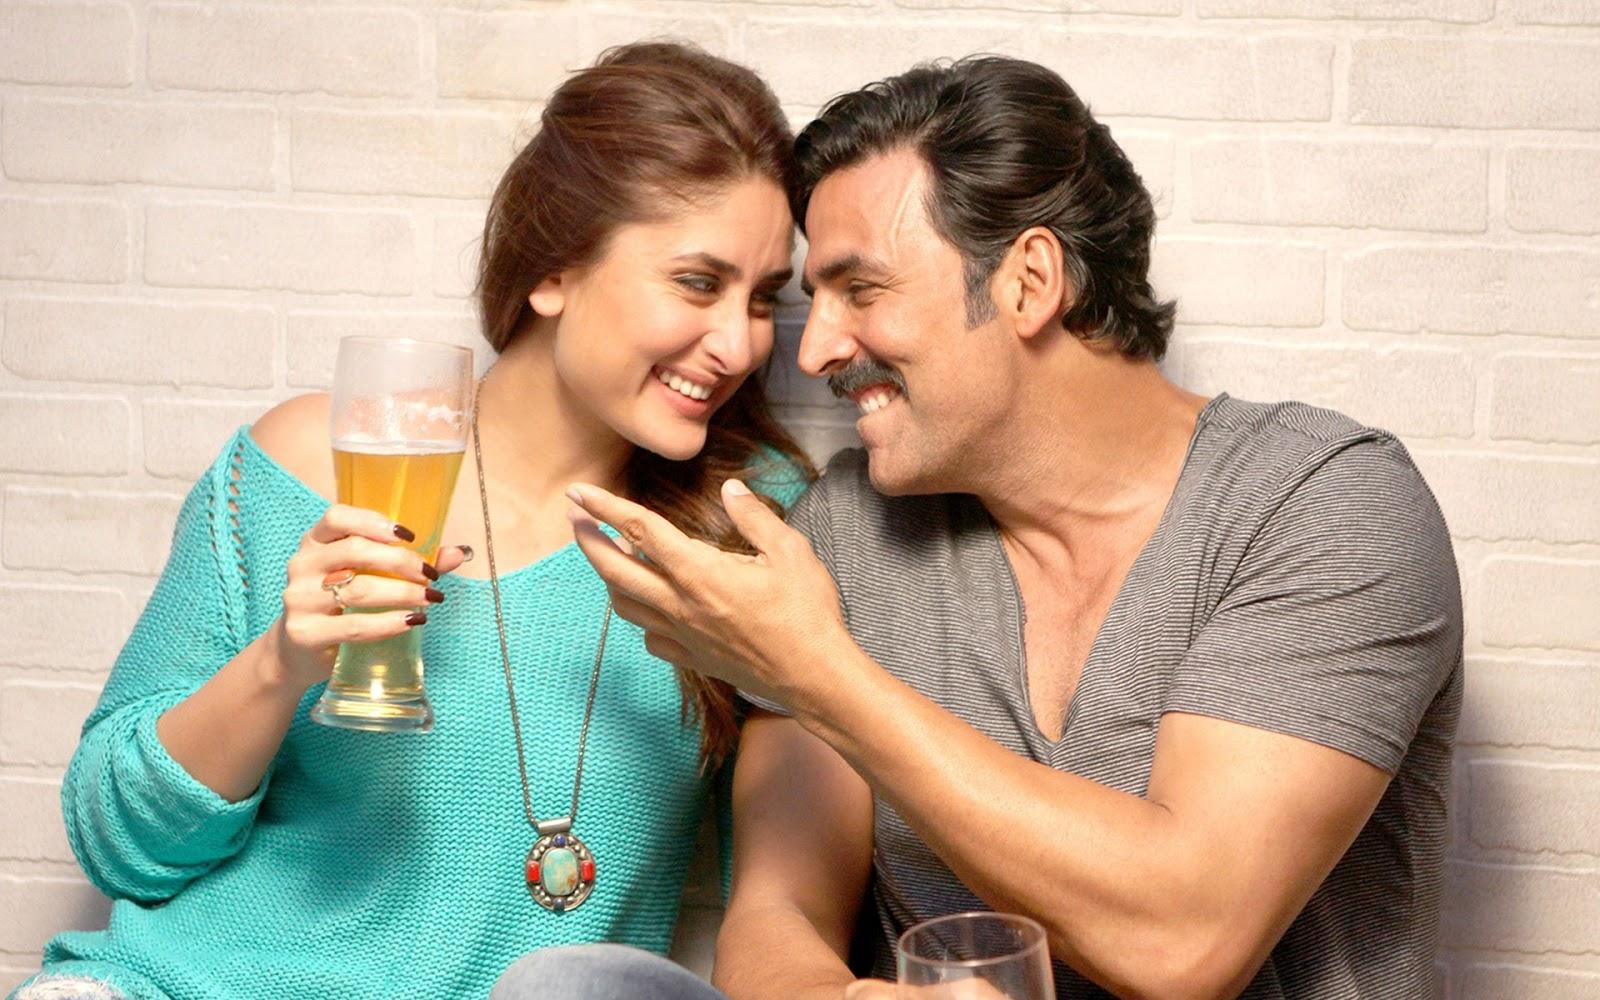 Good News: Akshay Kumar on Kareena Kapoor Khan open up about their friendly banter